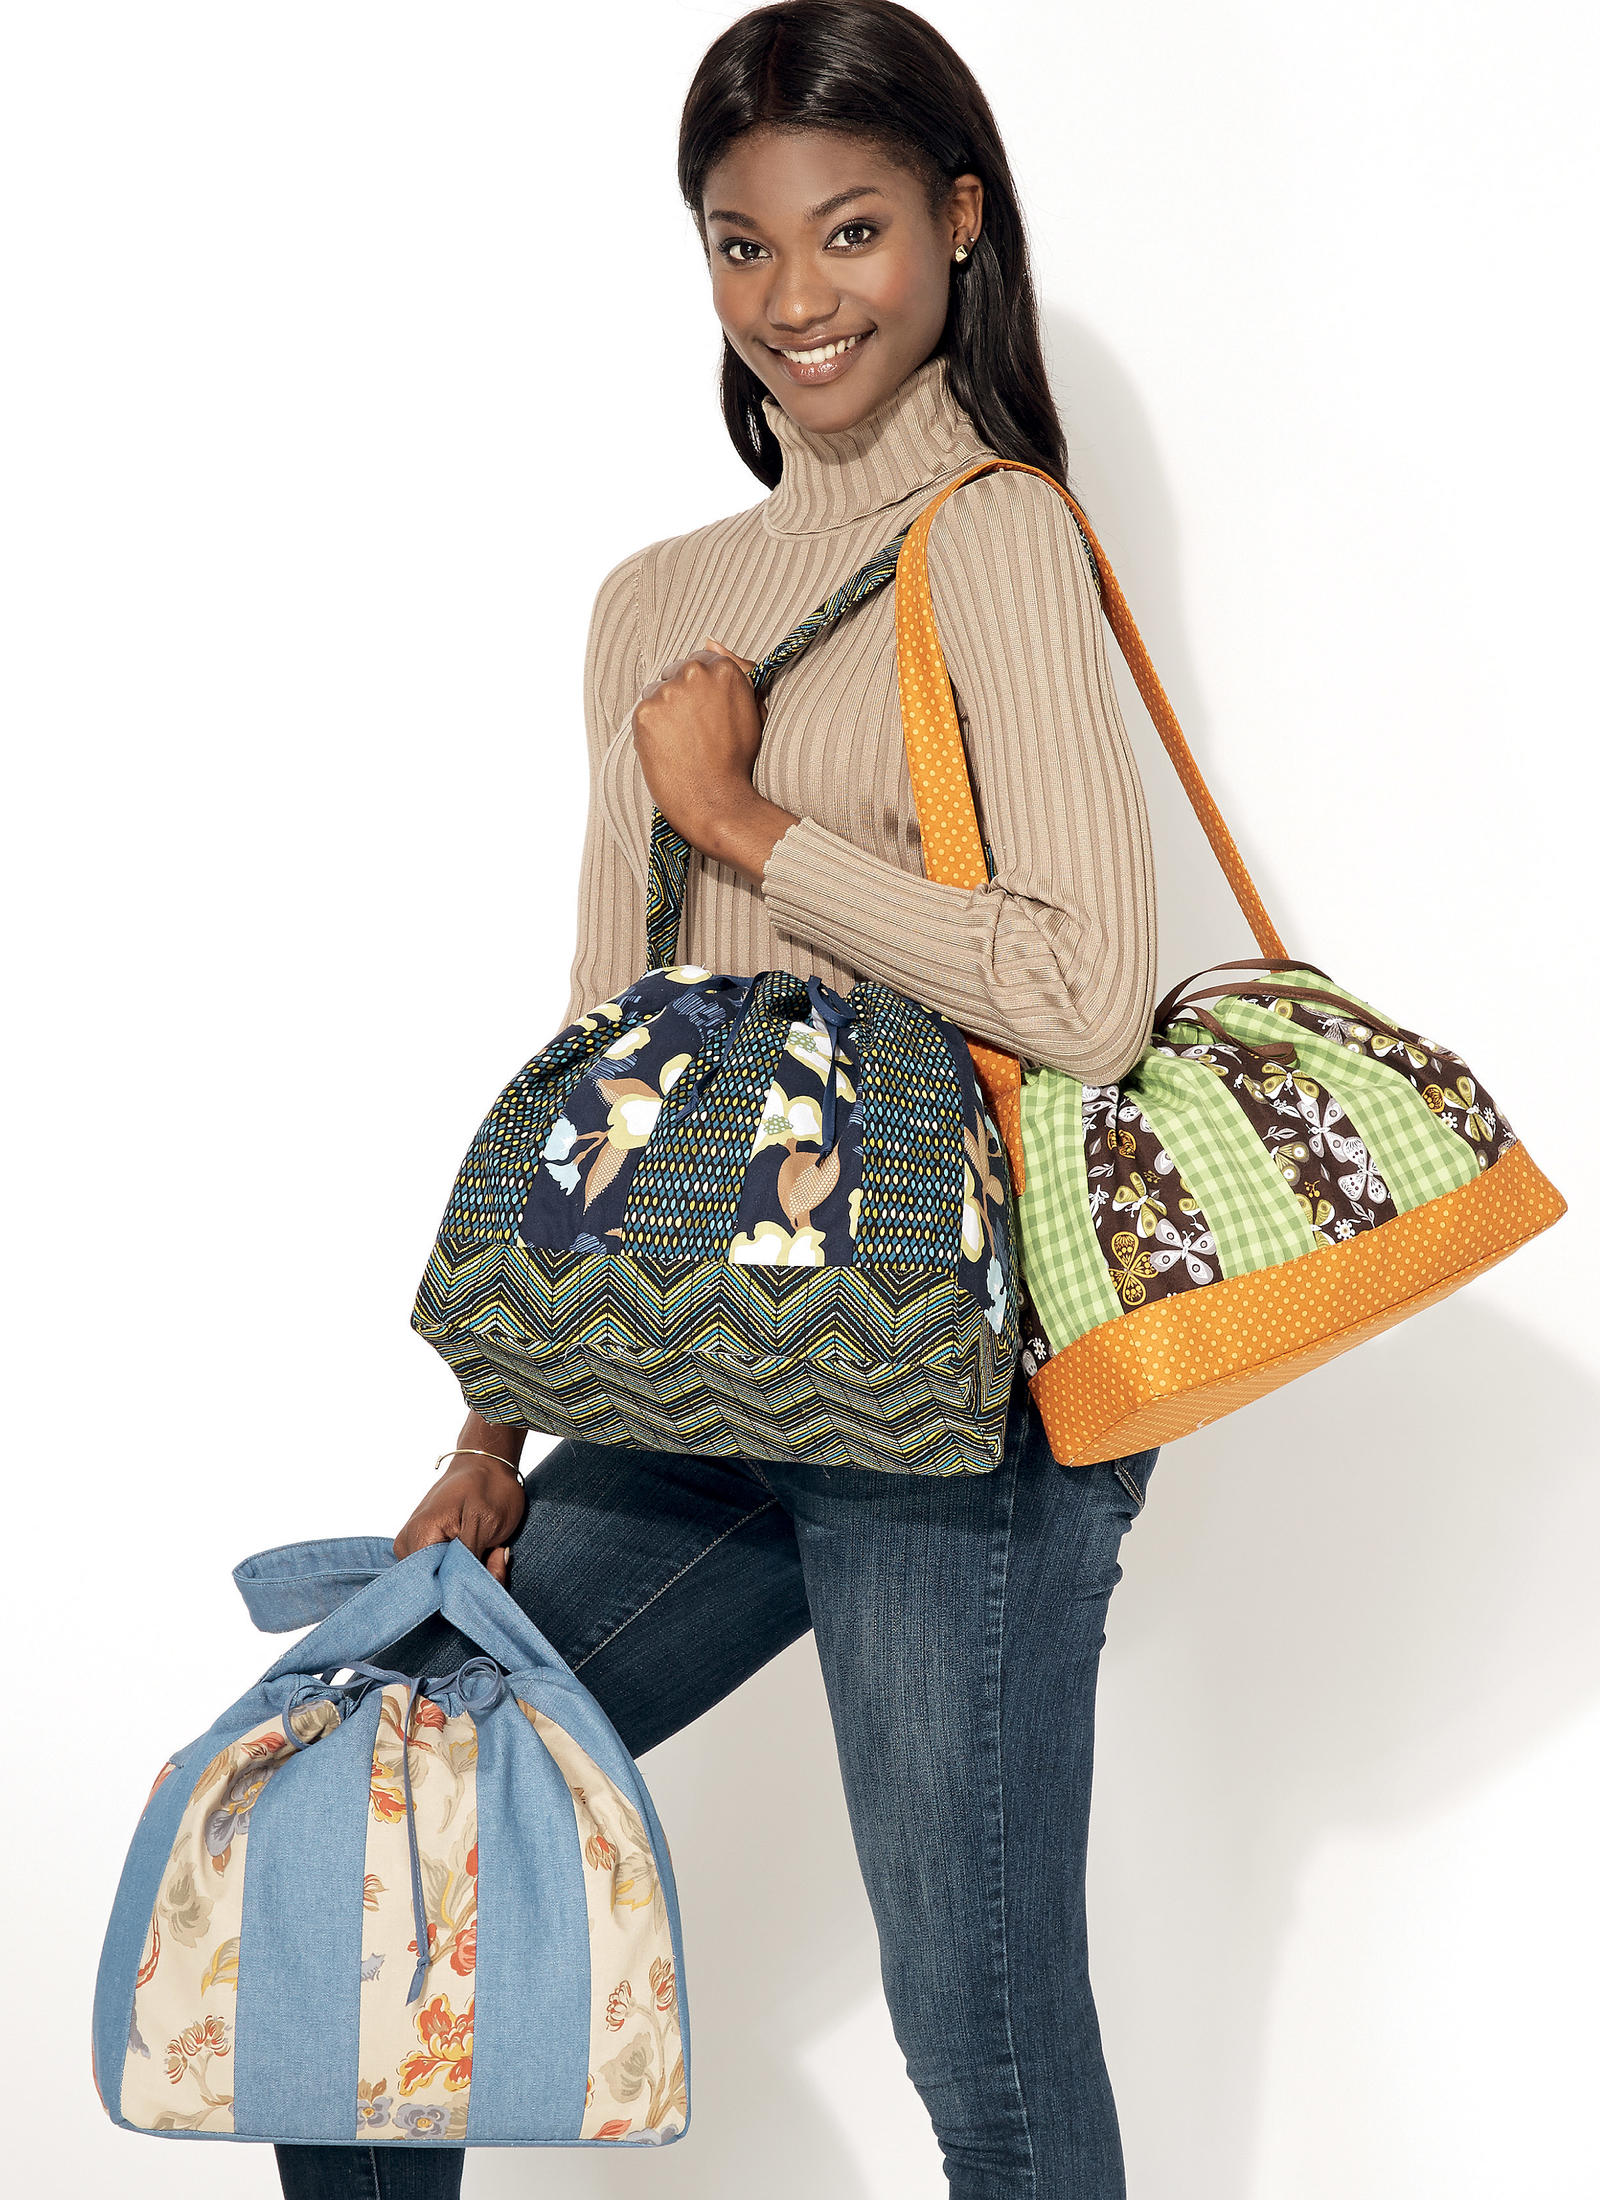 KwikSew K0230 bags